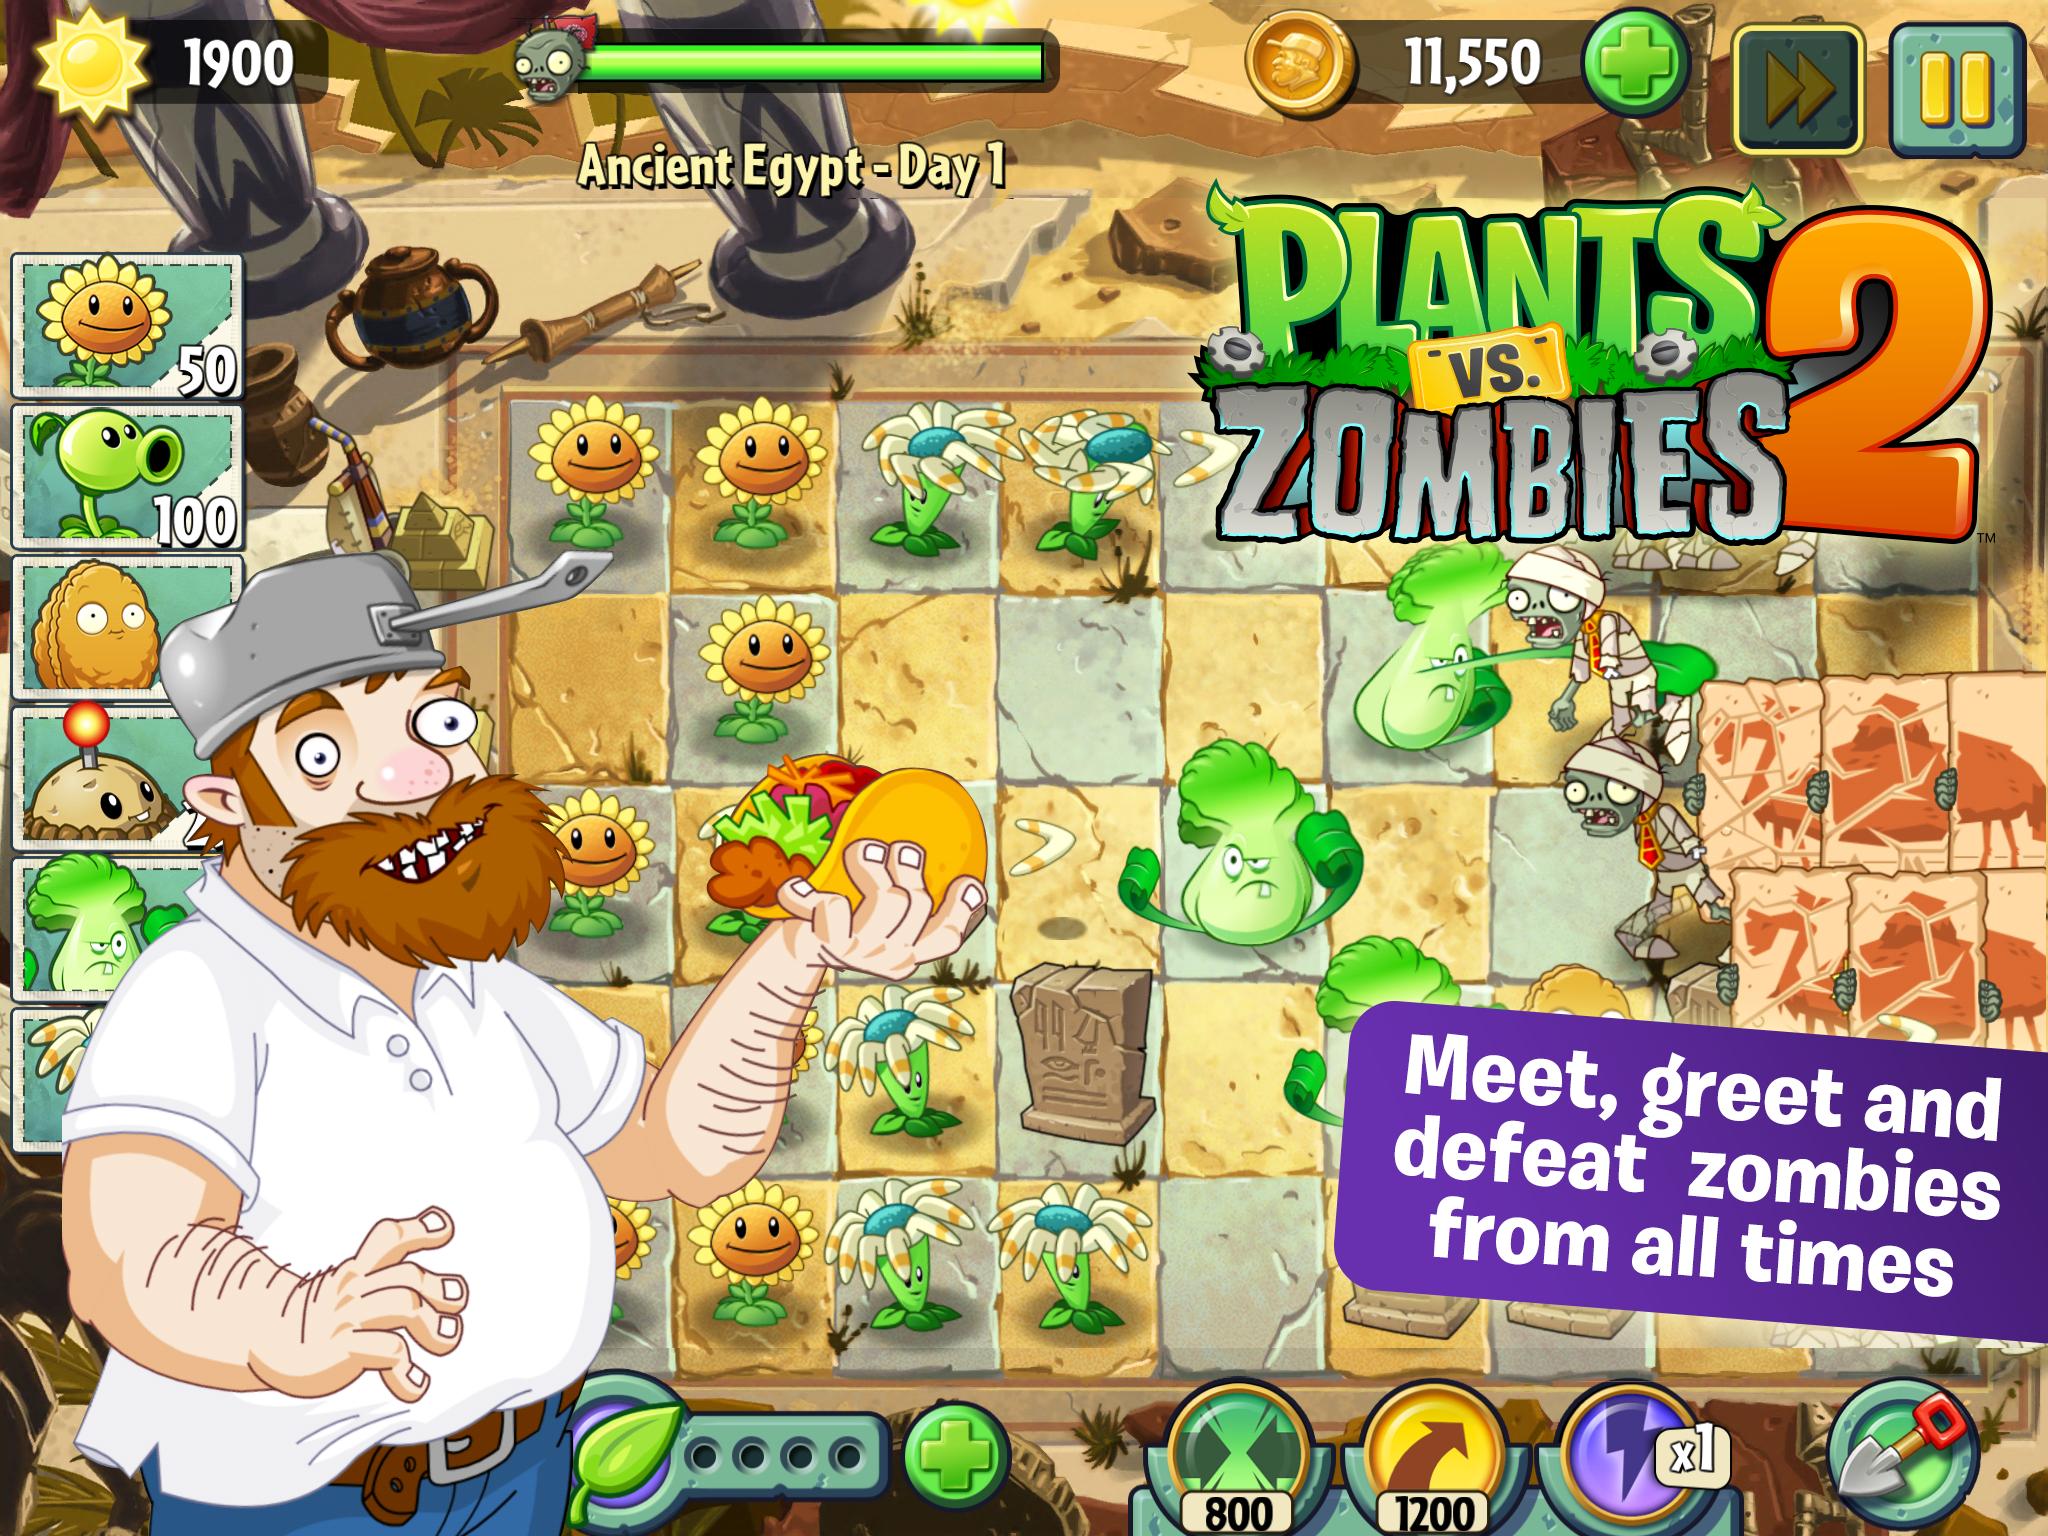 plants vs zombies 2 hacked all plants unlocked online